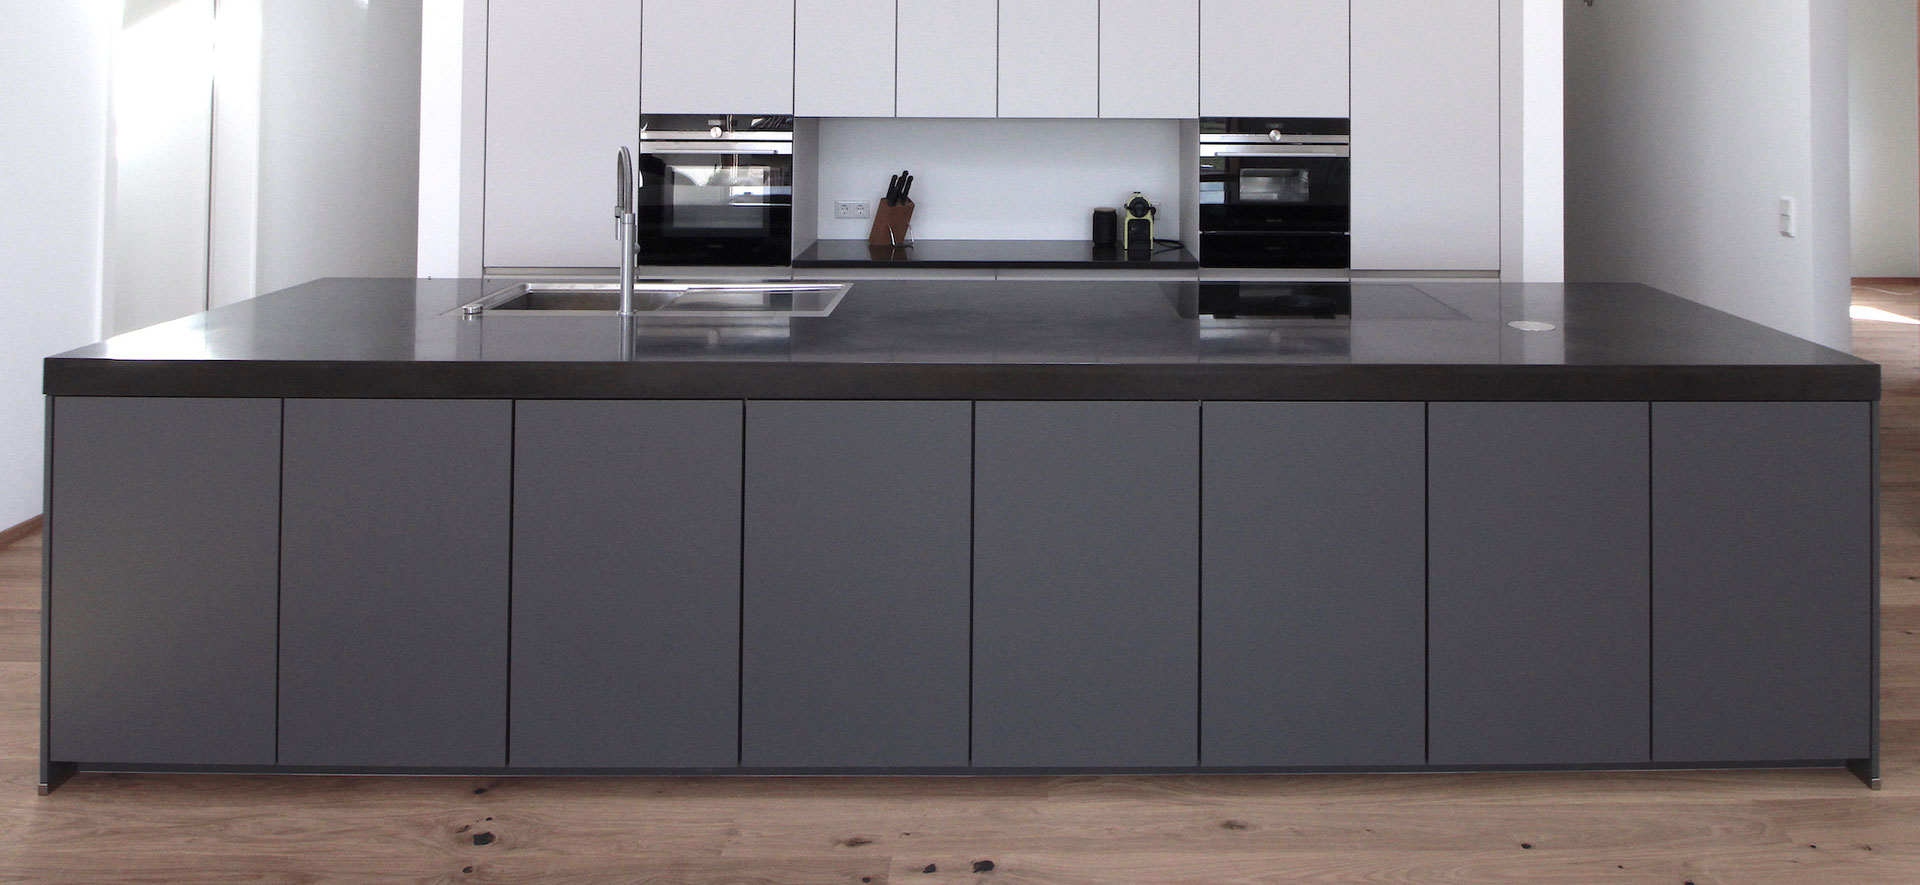 werftbeton Beton-Küchenarbeitsplatten, Betonmöbel ...